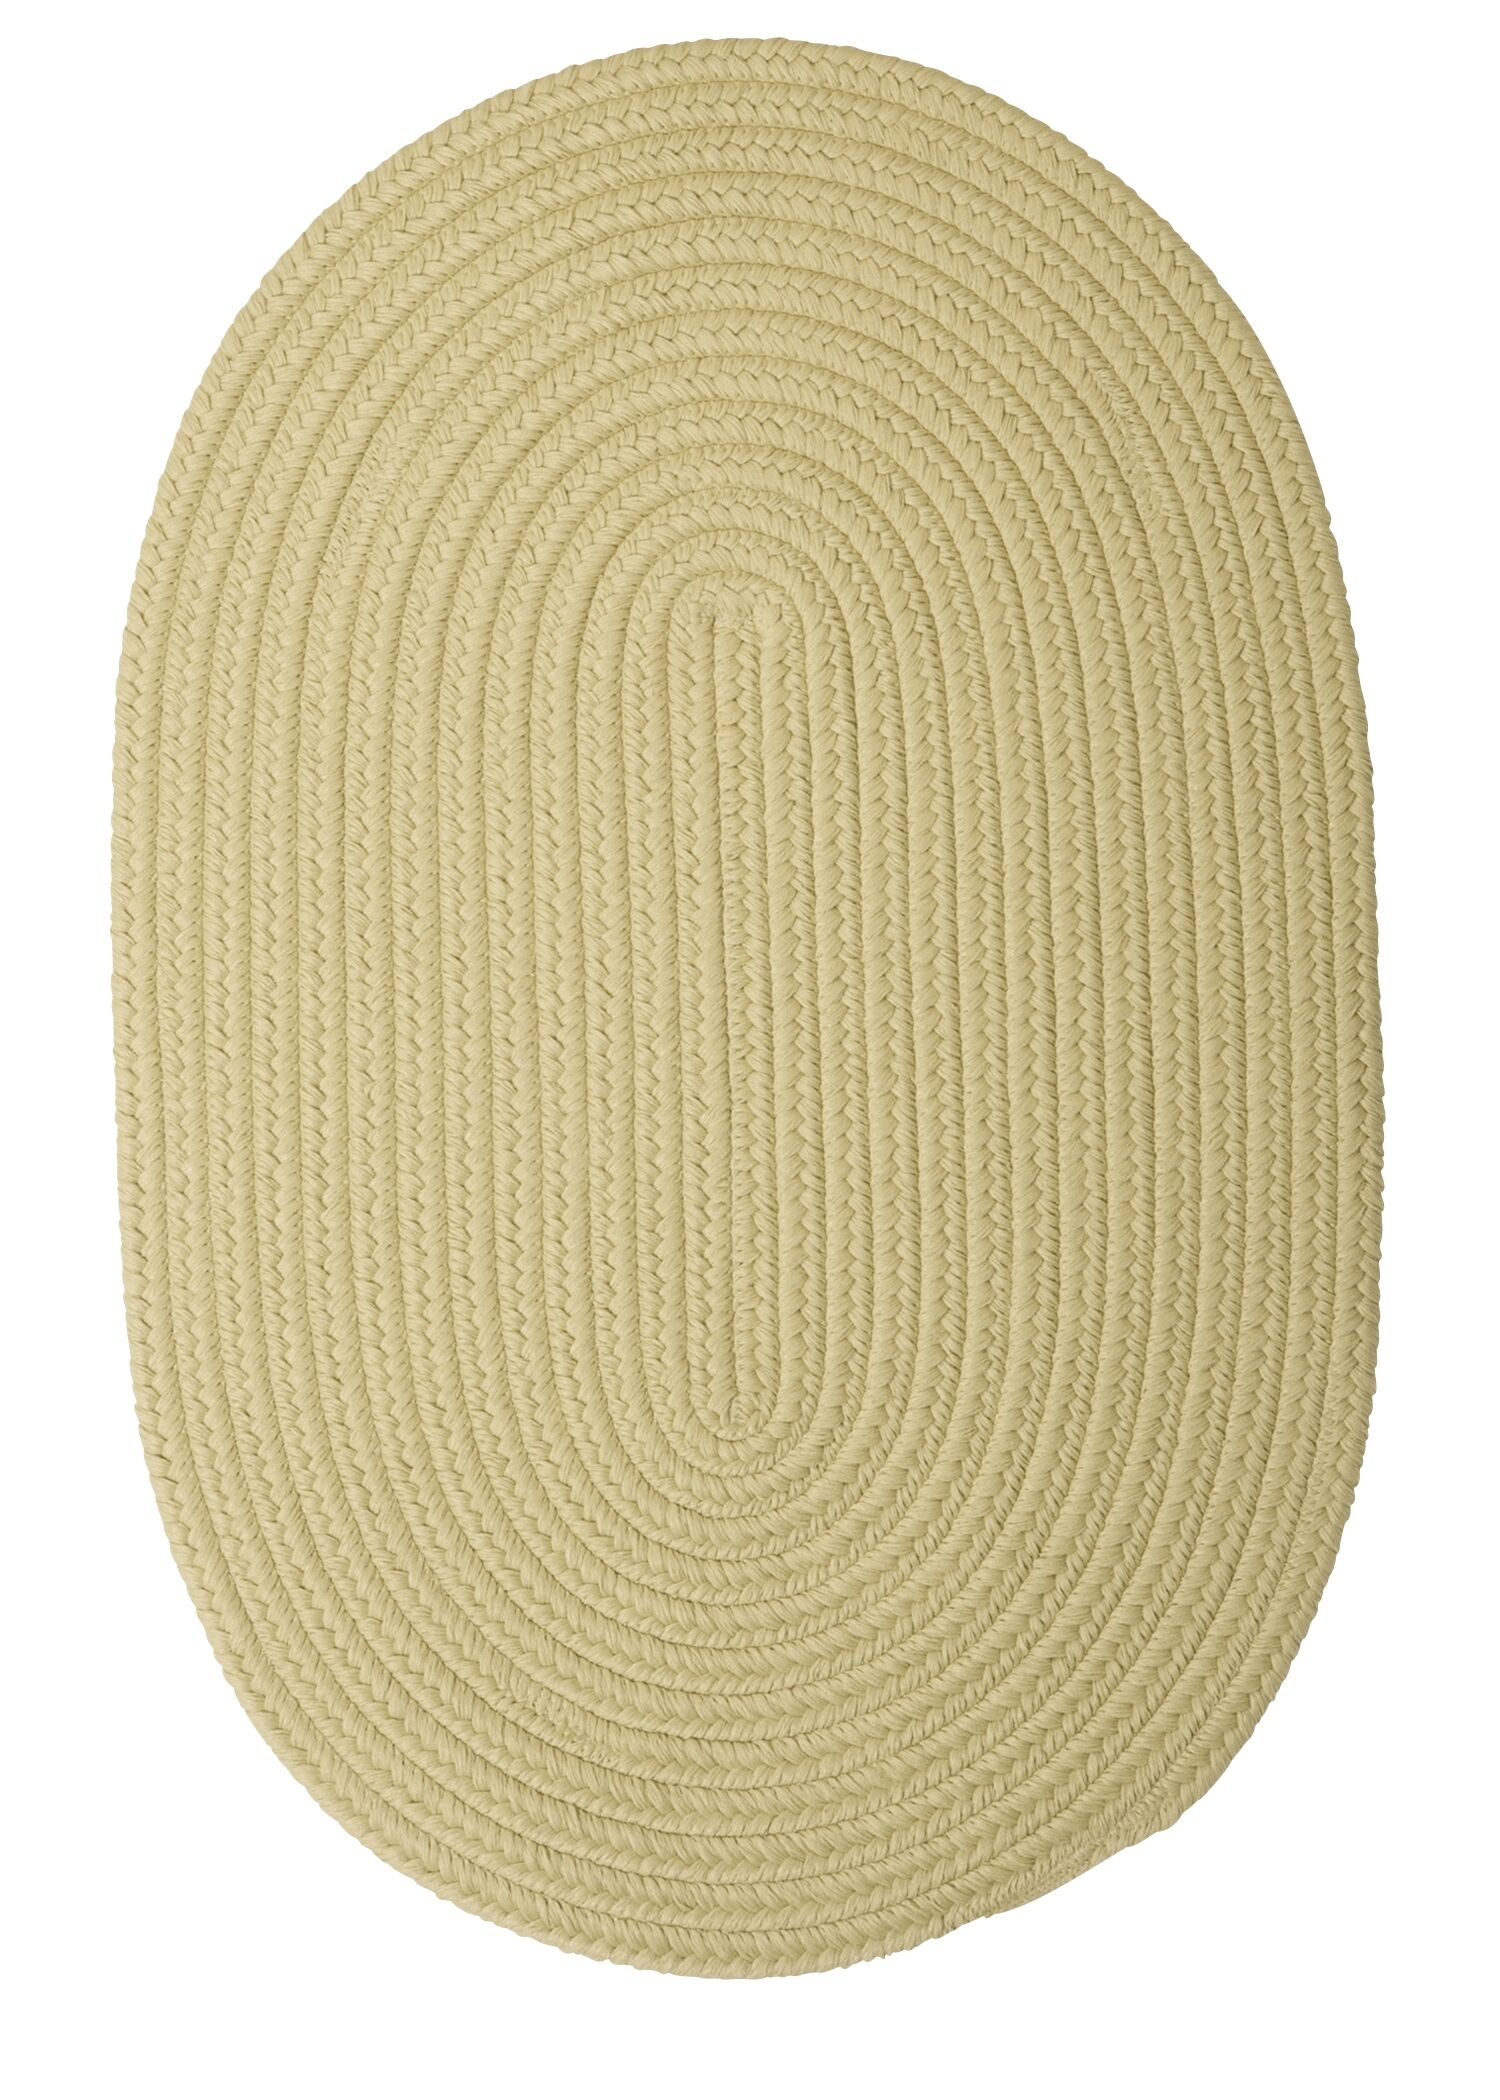 Mcintyre Celery Outdoor Area Rug Rug Size: Oval 12' x 15'